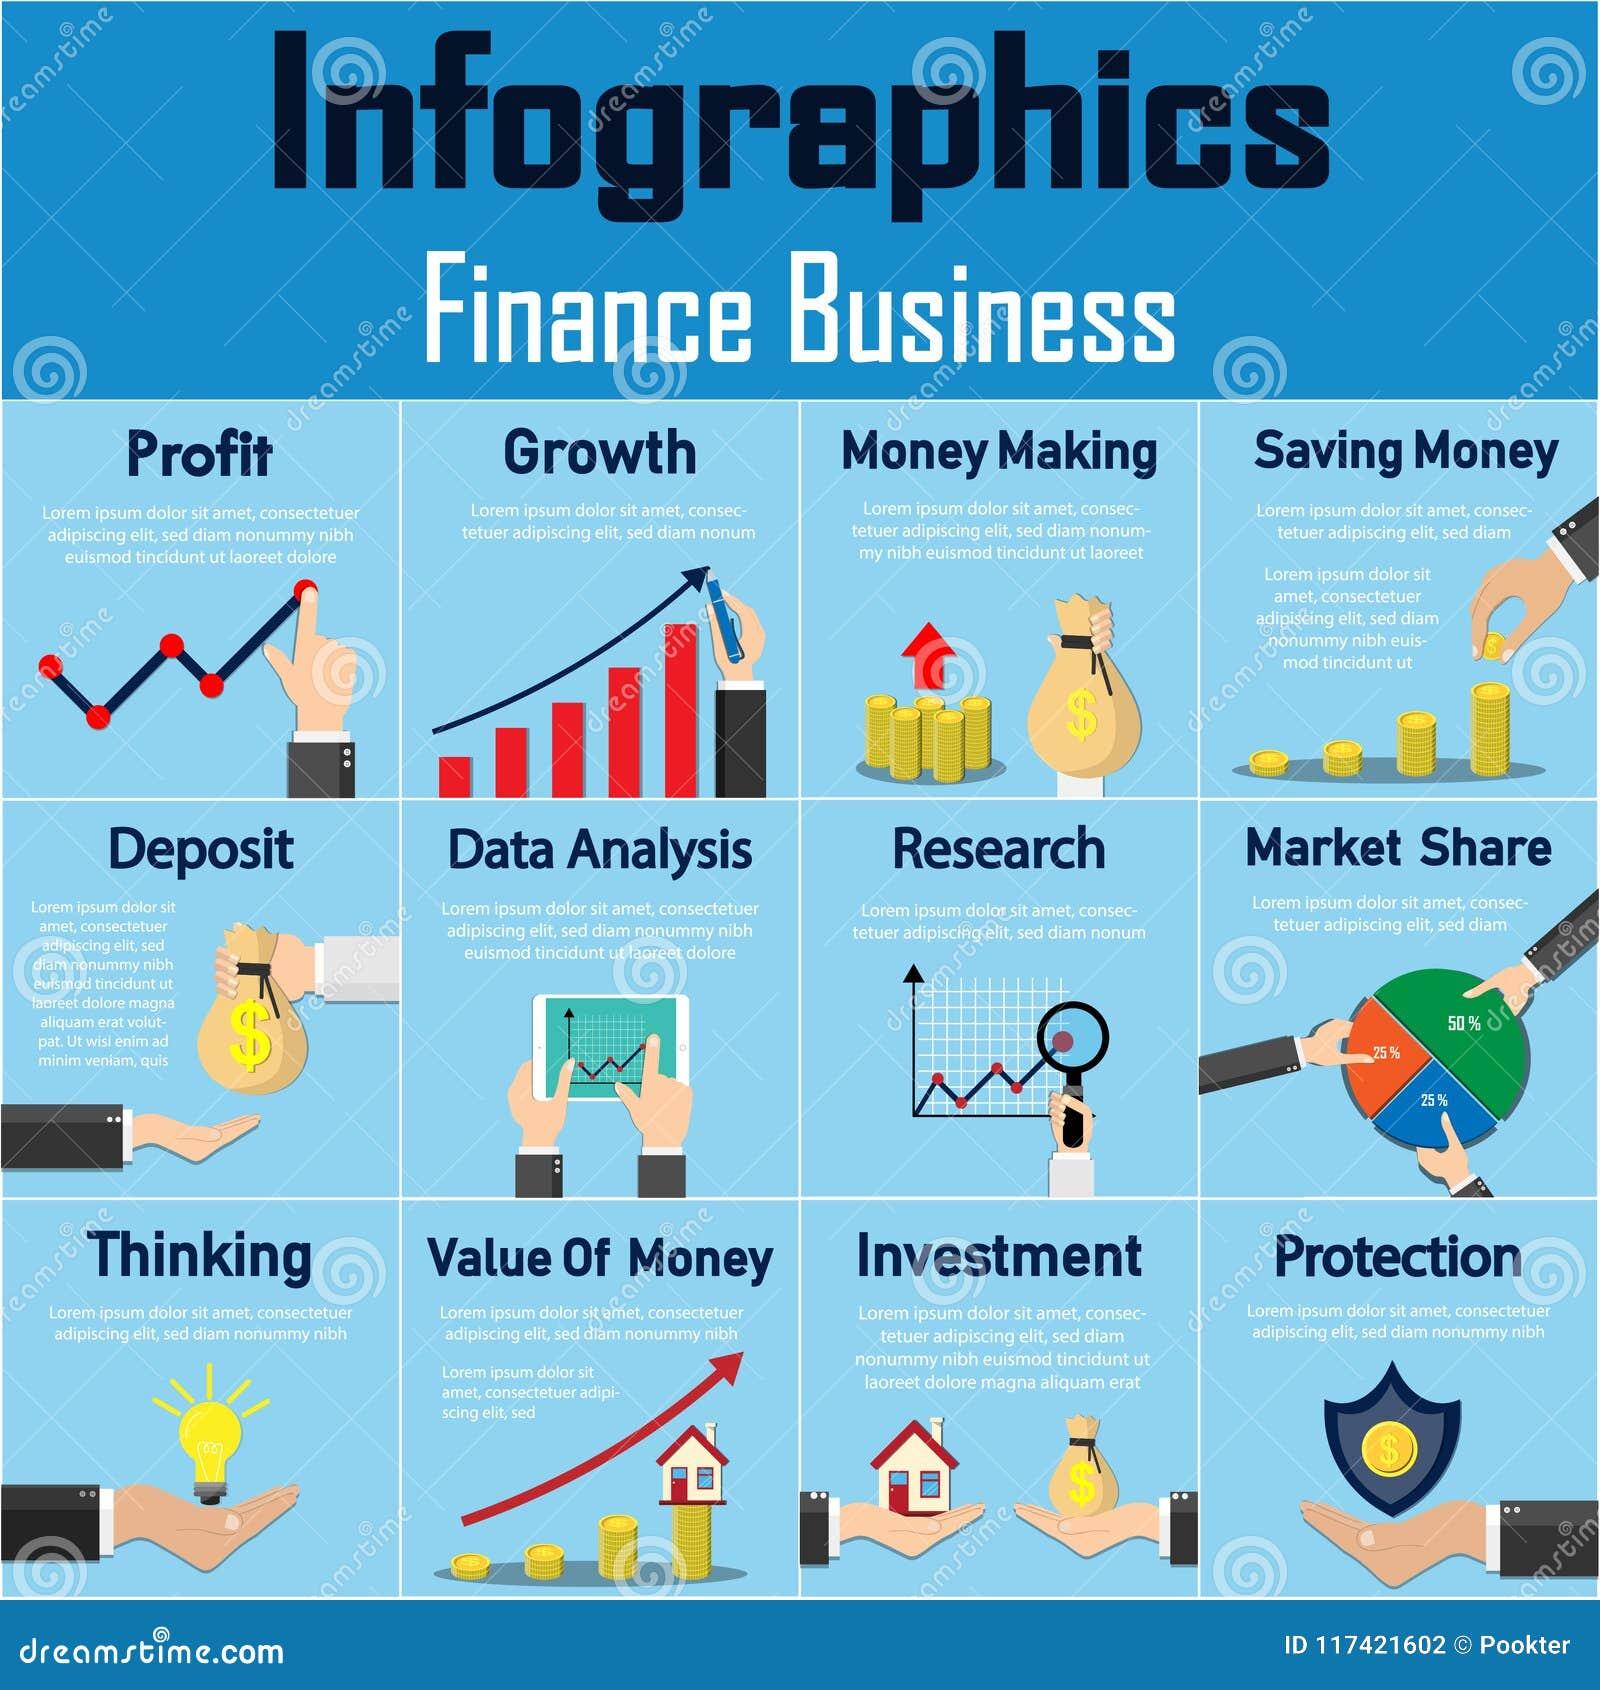 info-graphics-finance-business-profit-gr